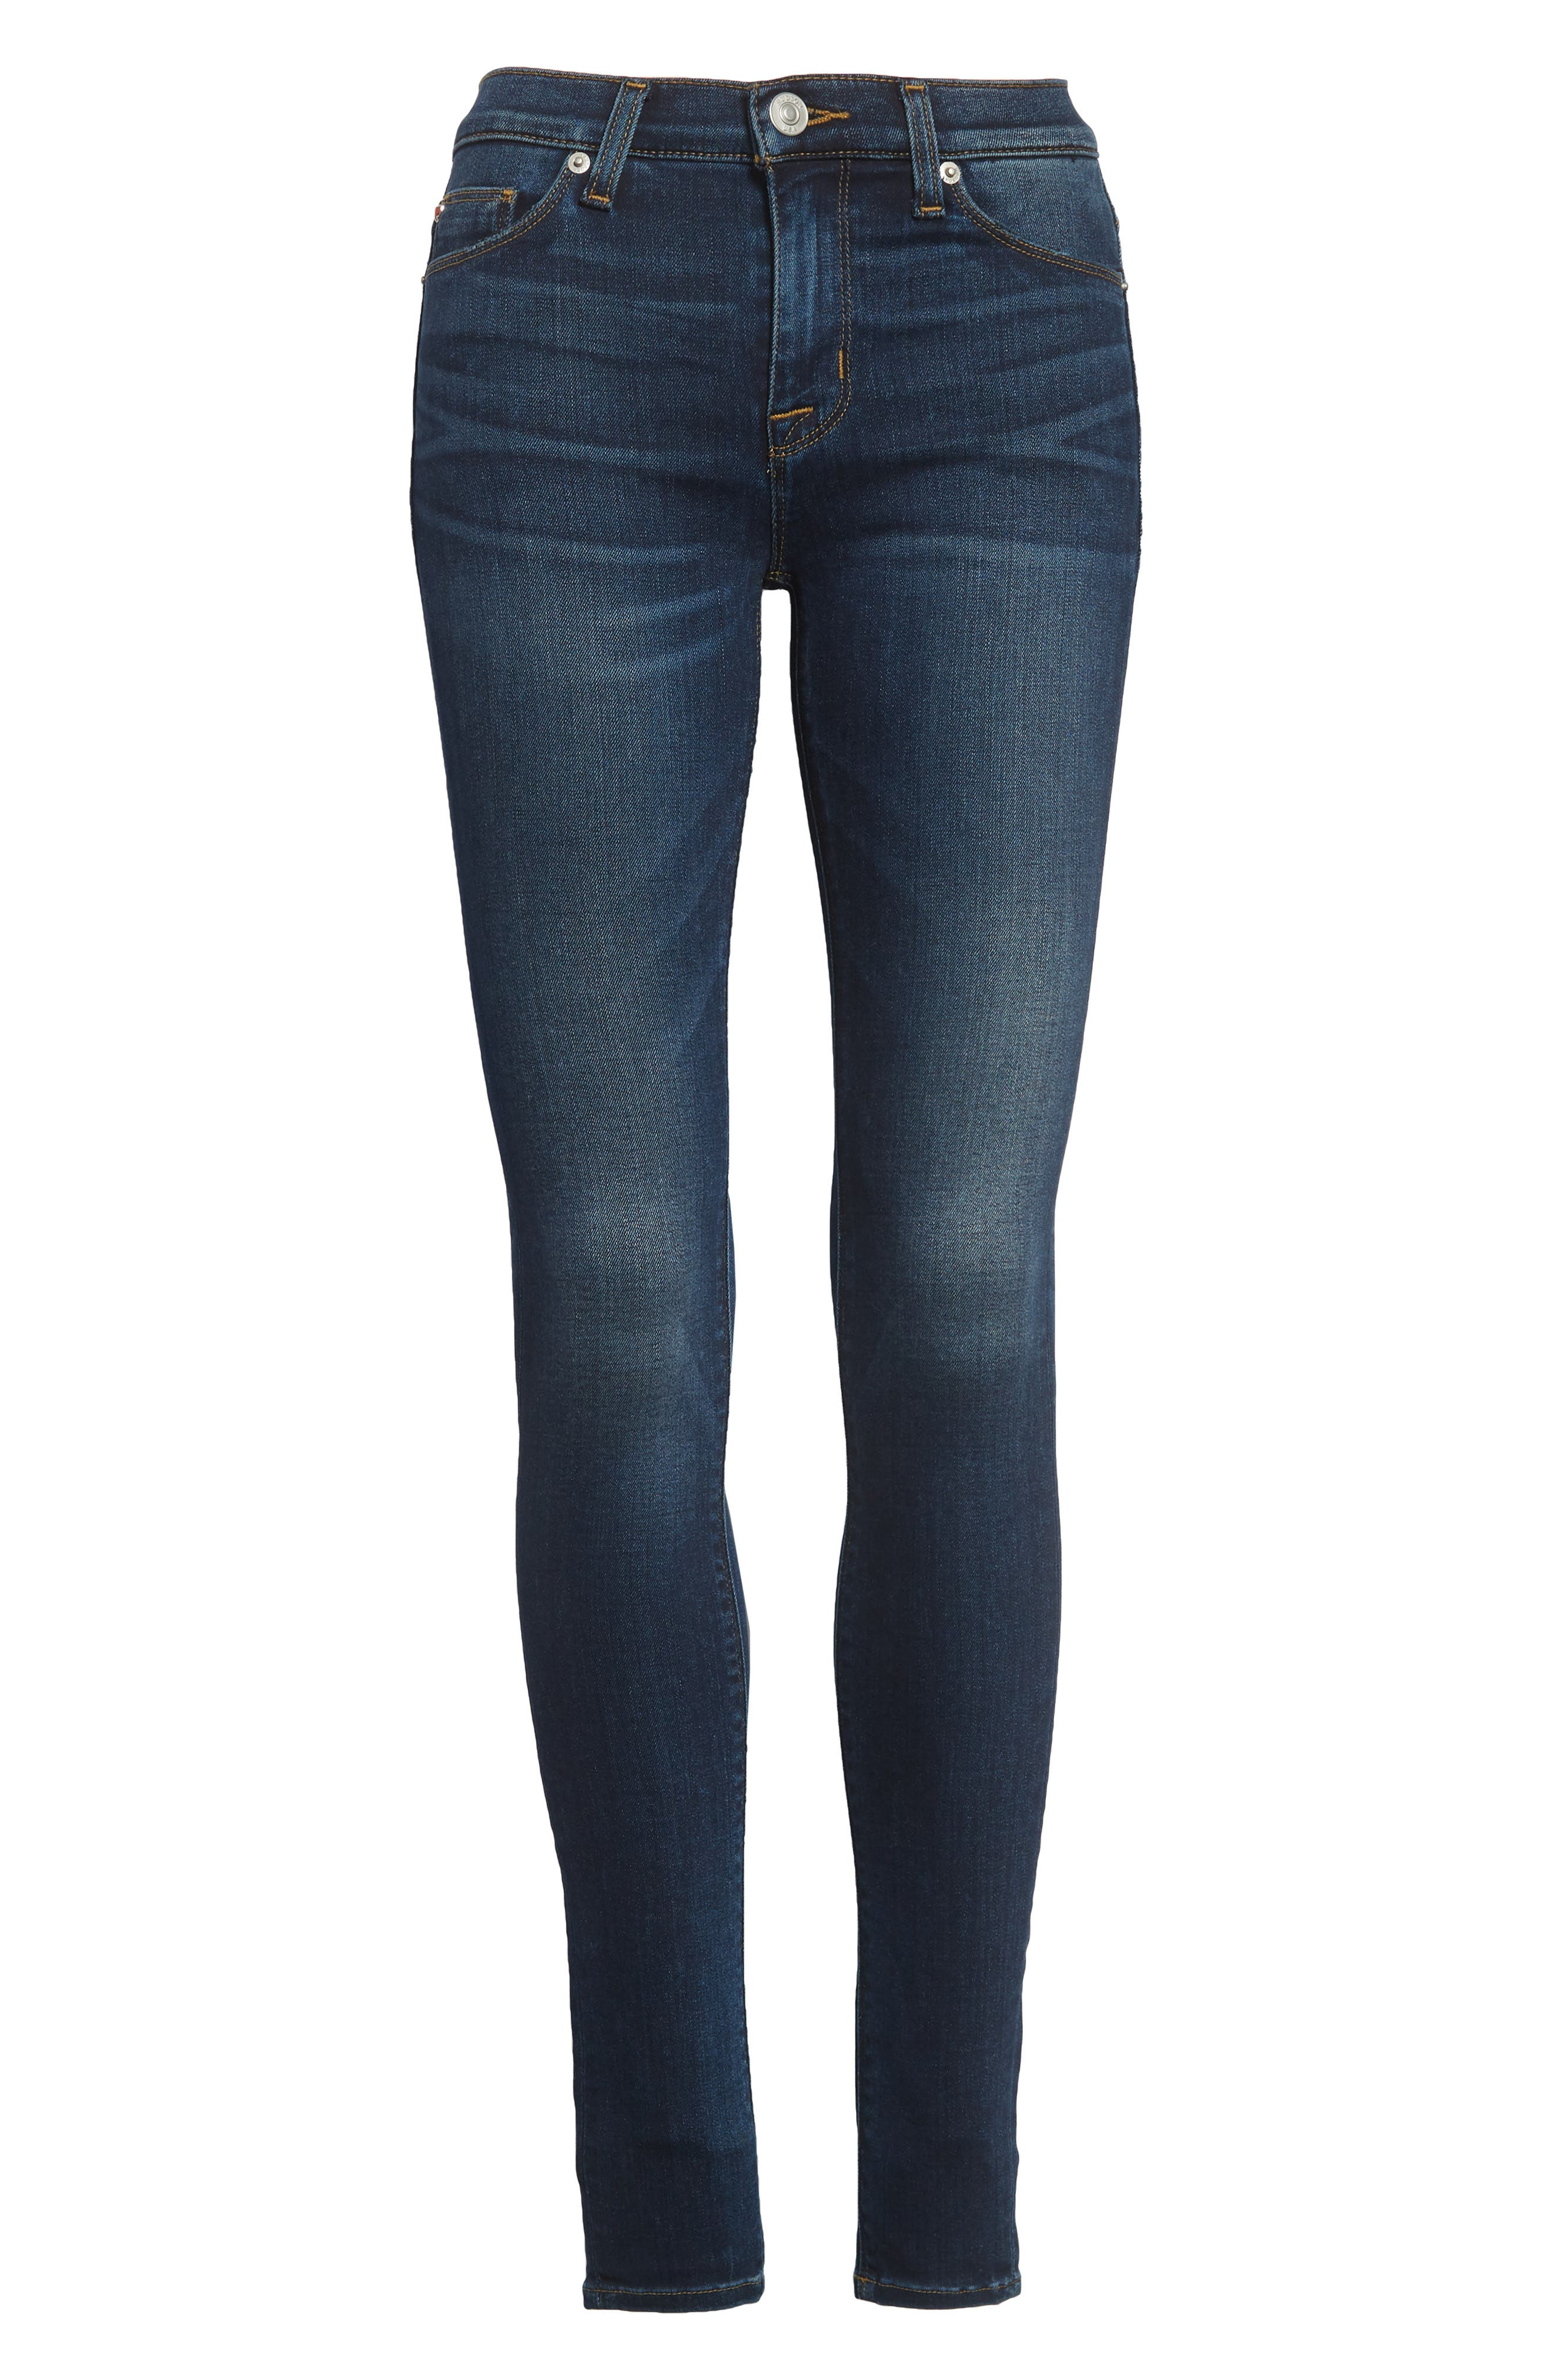 Nico Supermodel Skinny Jeans,                             Alternate thumbnail 7, color,                             BLUE GOLD